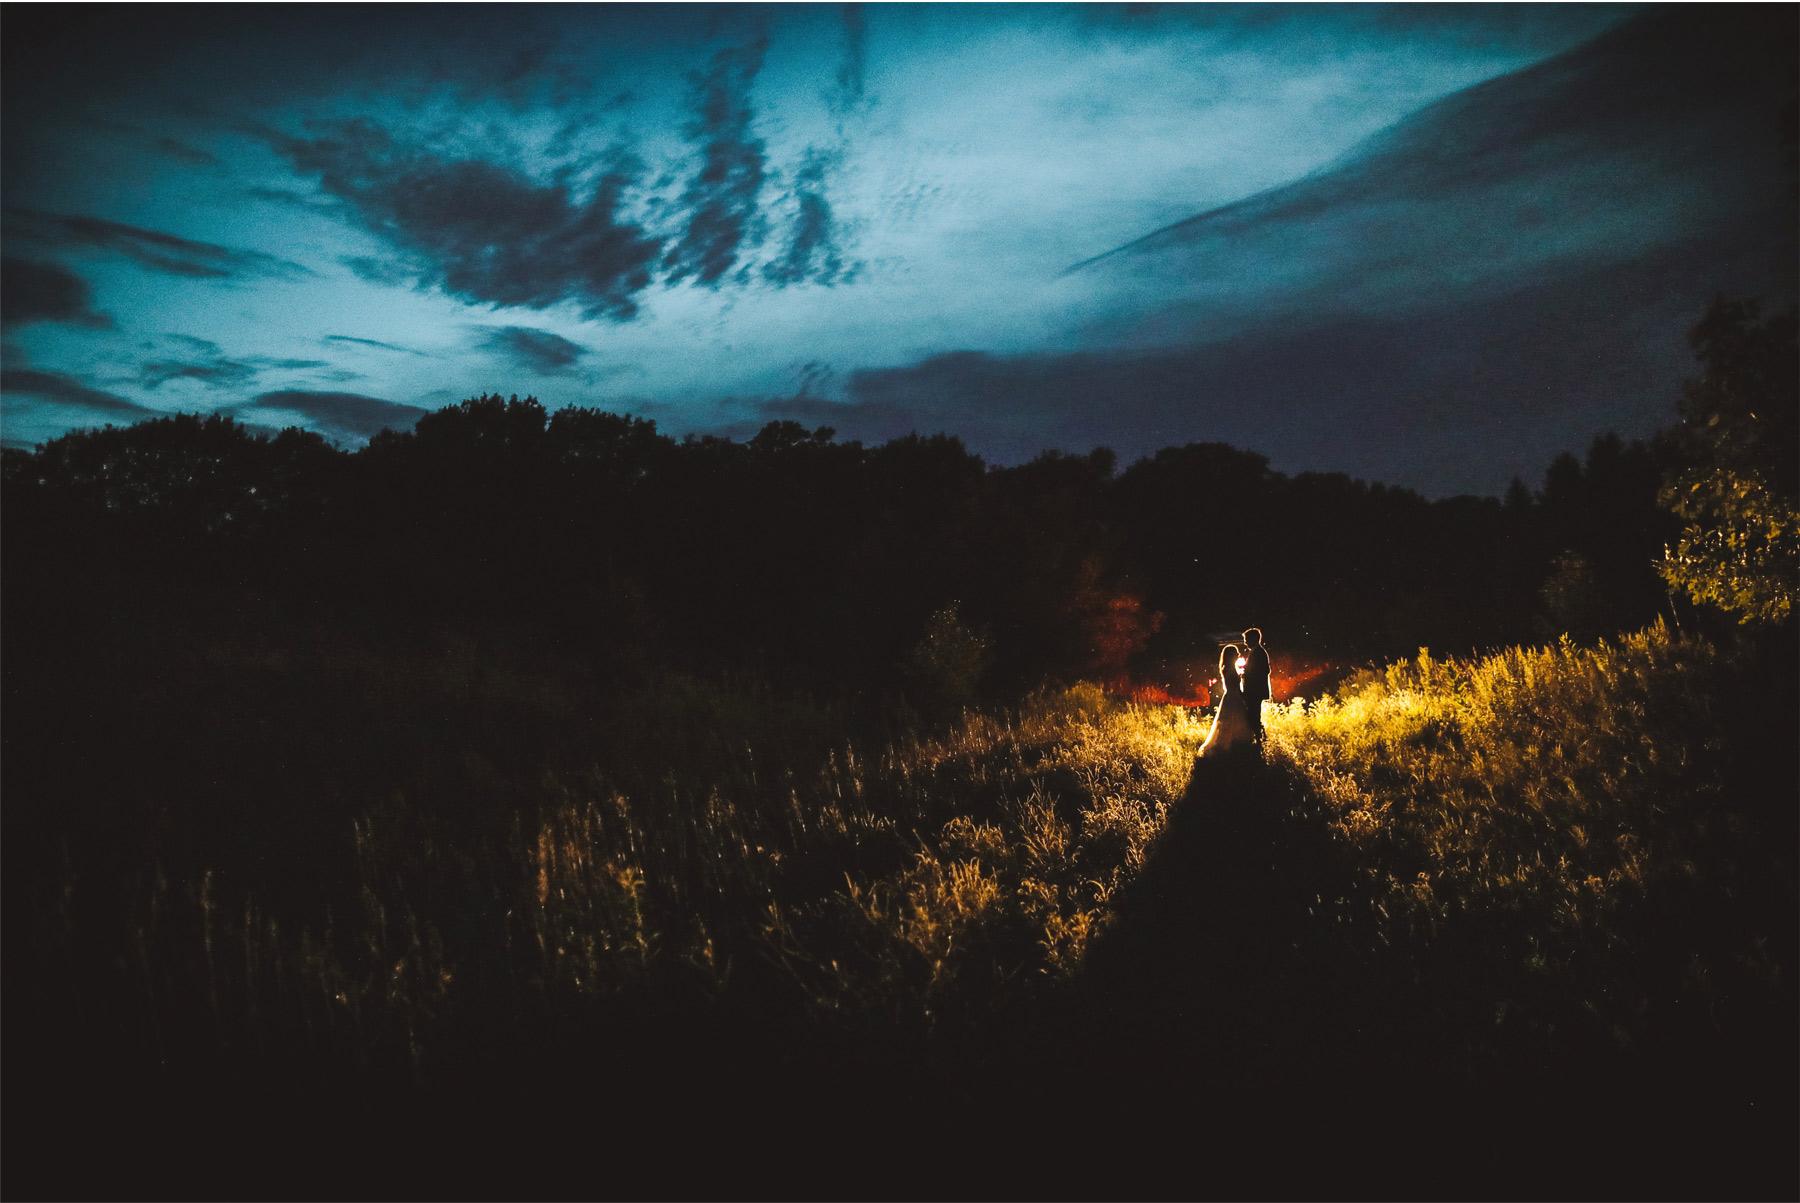 24-Weding-by-Vick-Photography-Minneapolis-Minnesota-Bavaria-Downs-Summer-Night-Bride-Groom-Rebecca-and-Mark.jpg